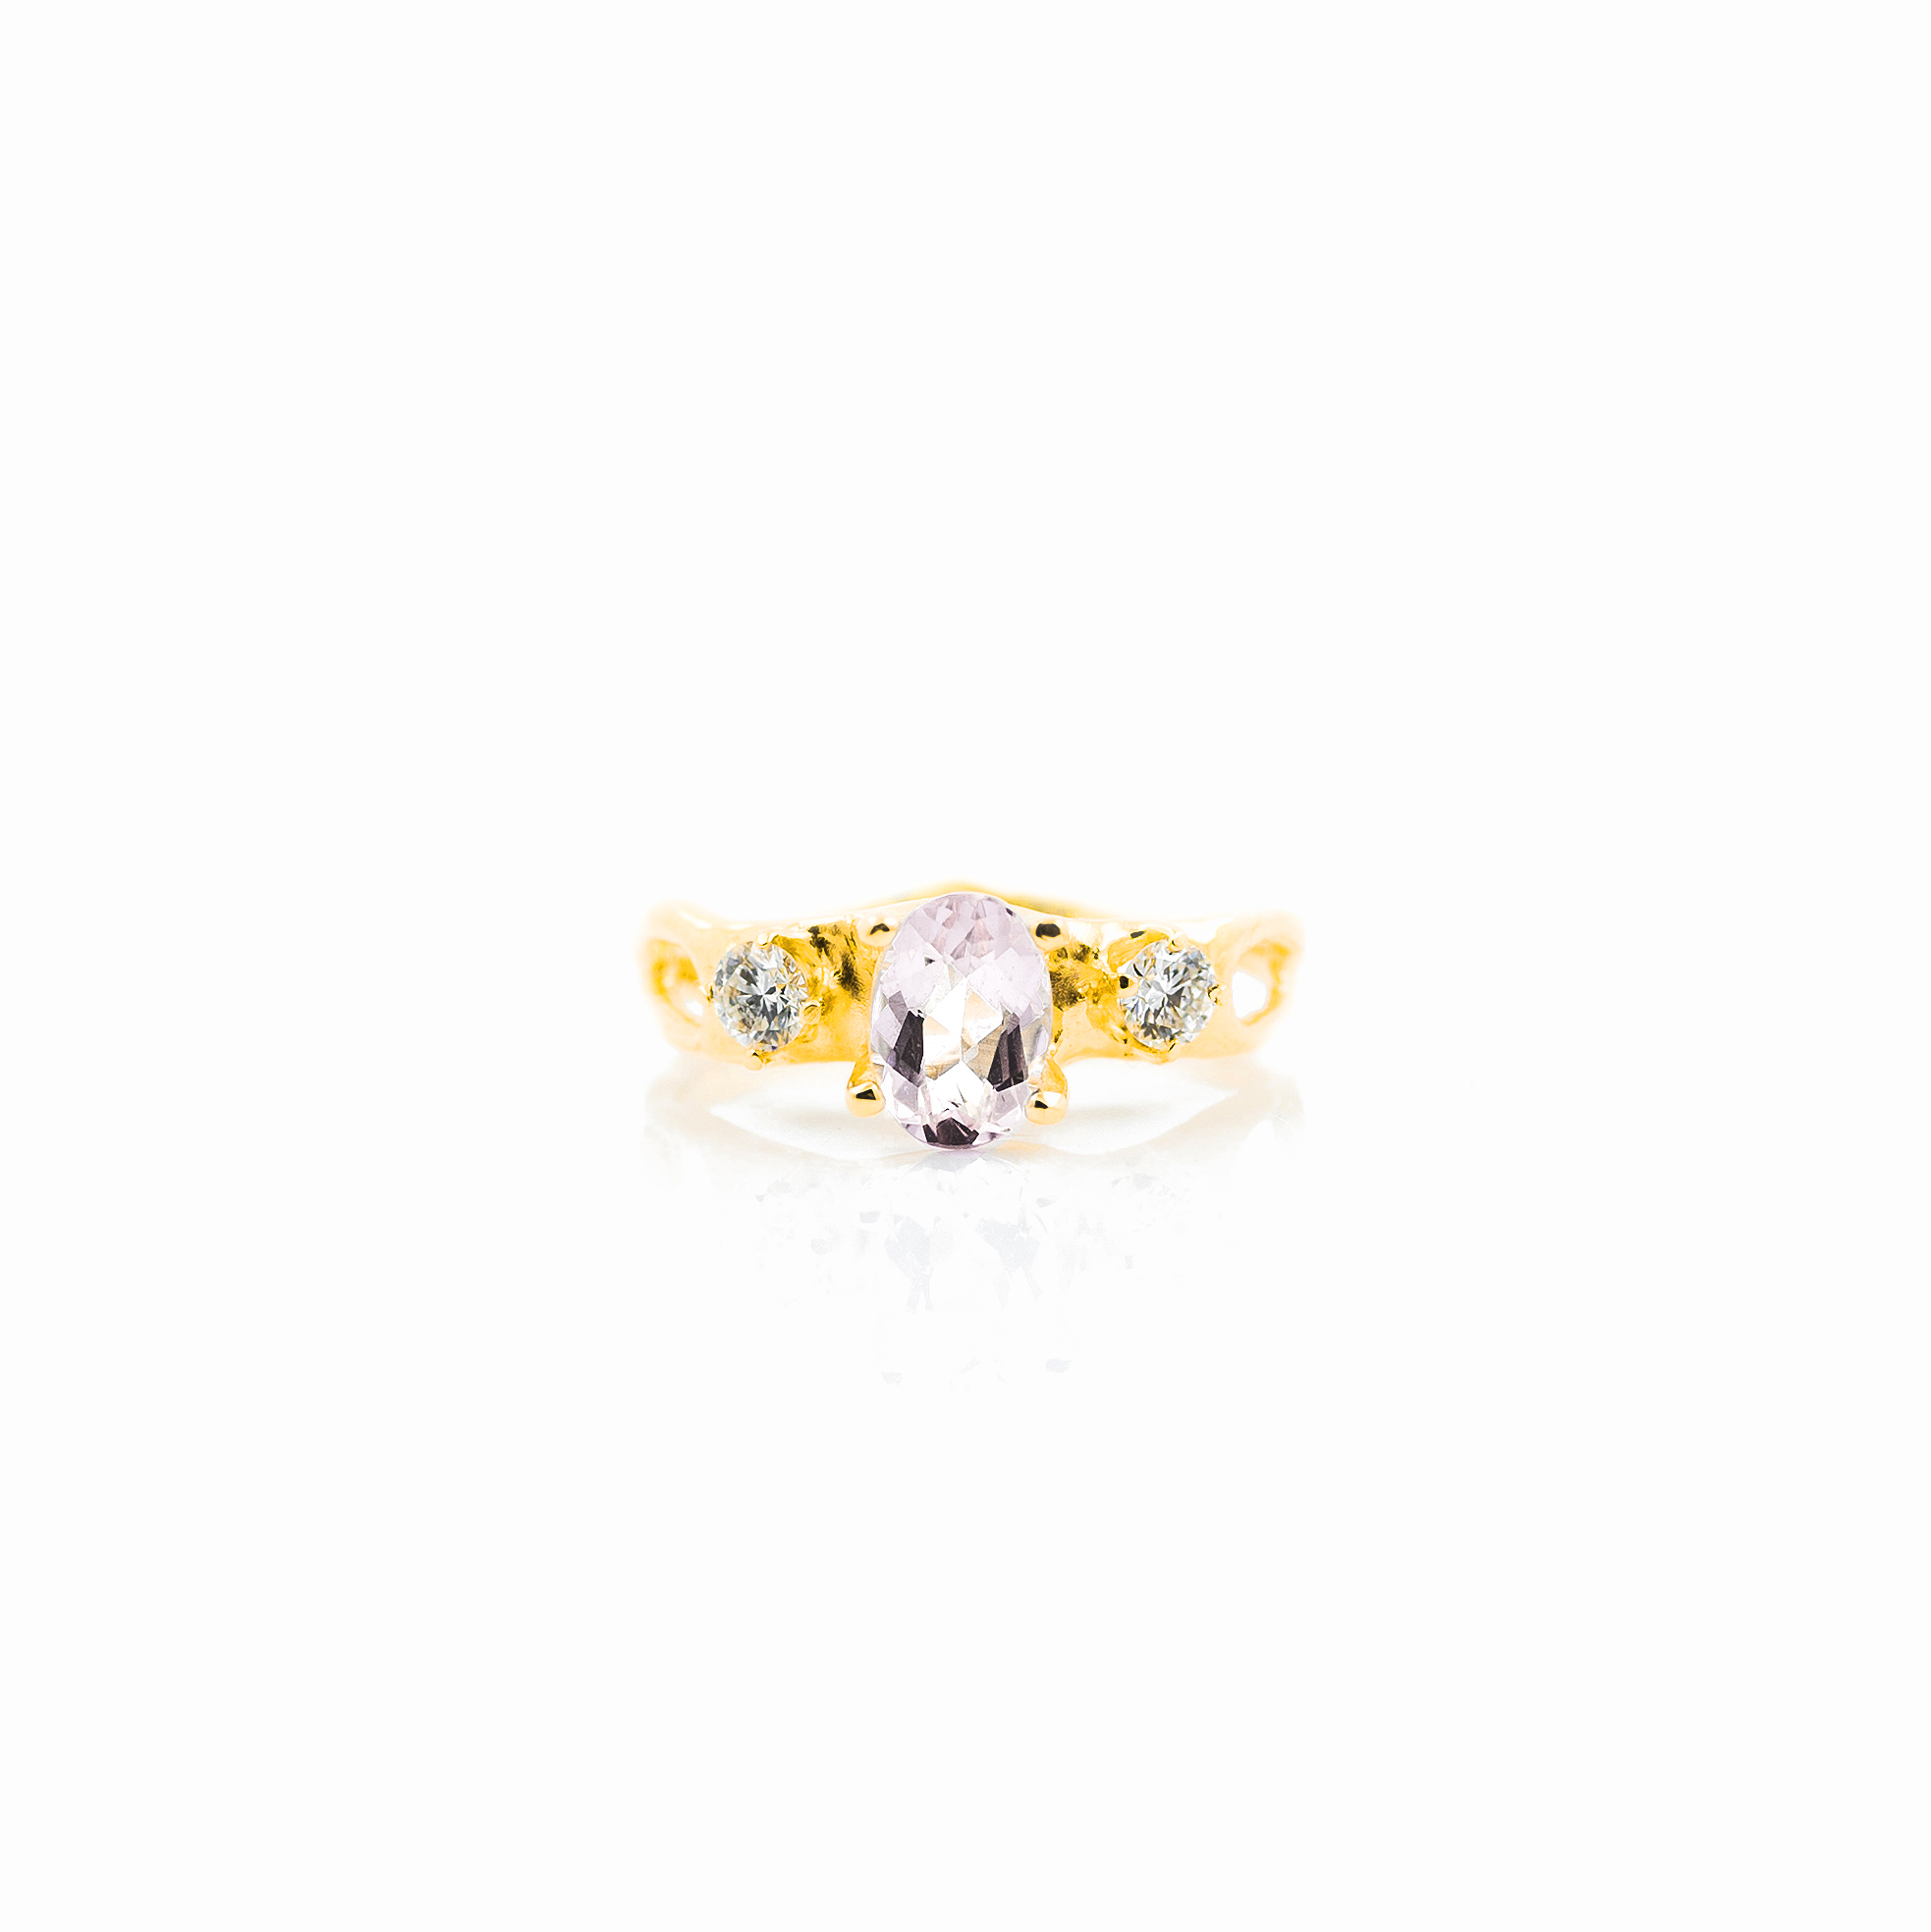 Unfolding Engagement Ring   18ct yellow gold, morganite, white diamonds